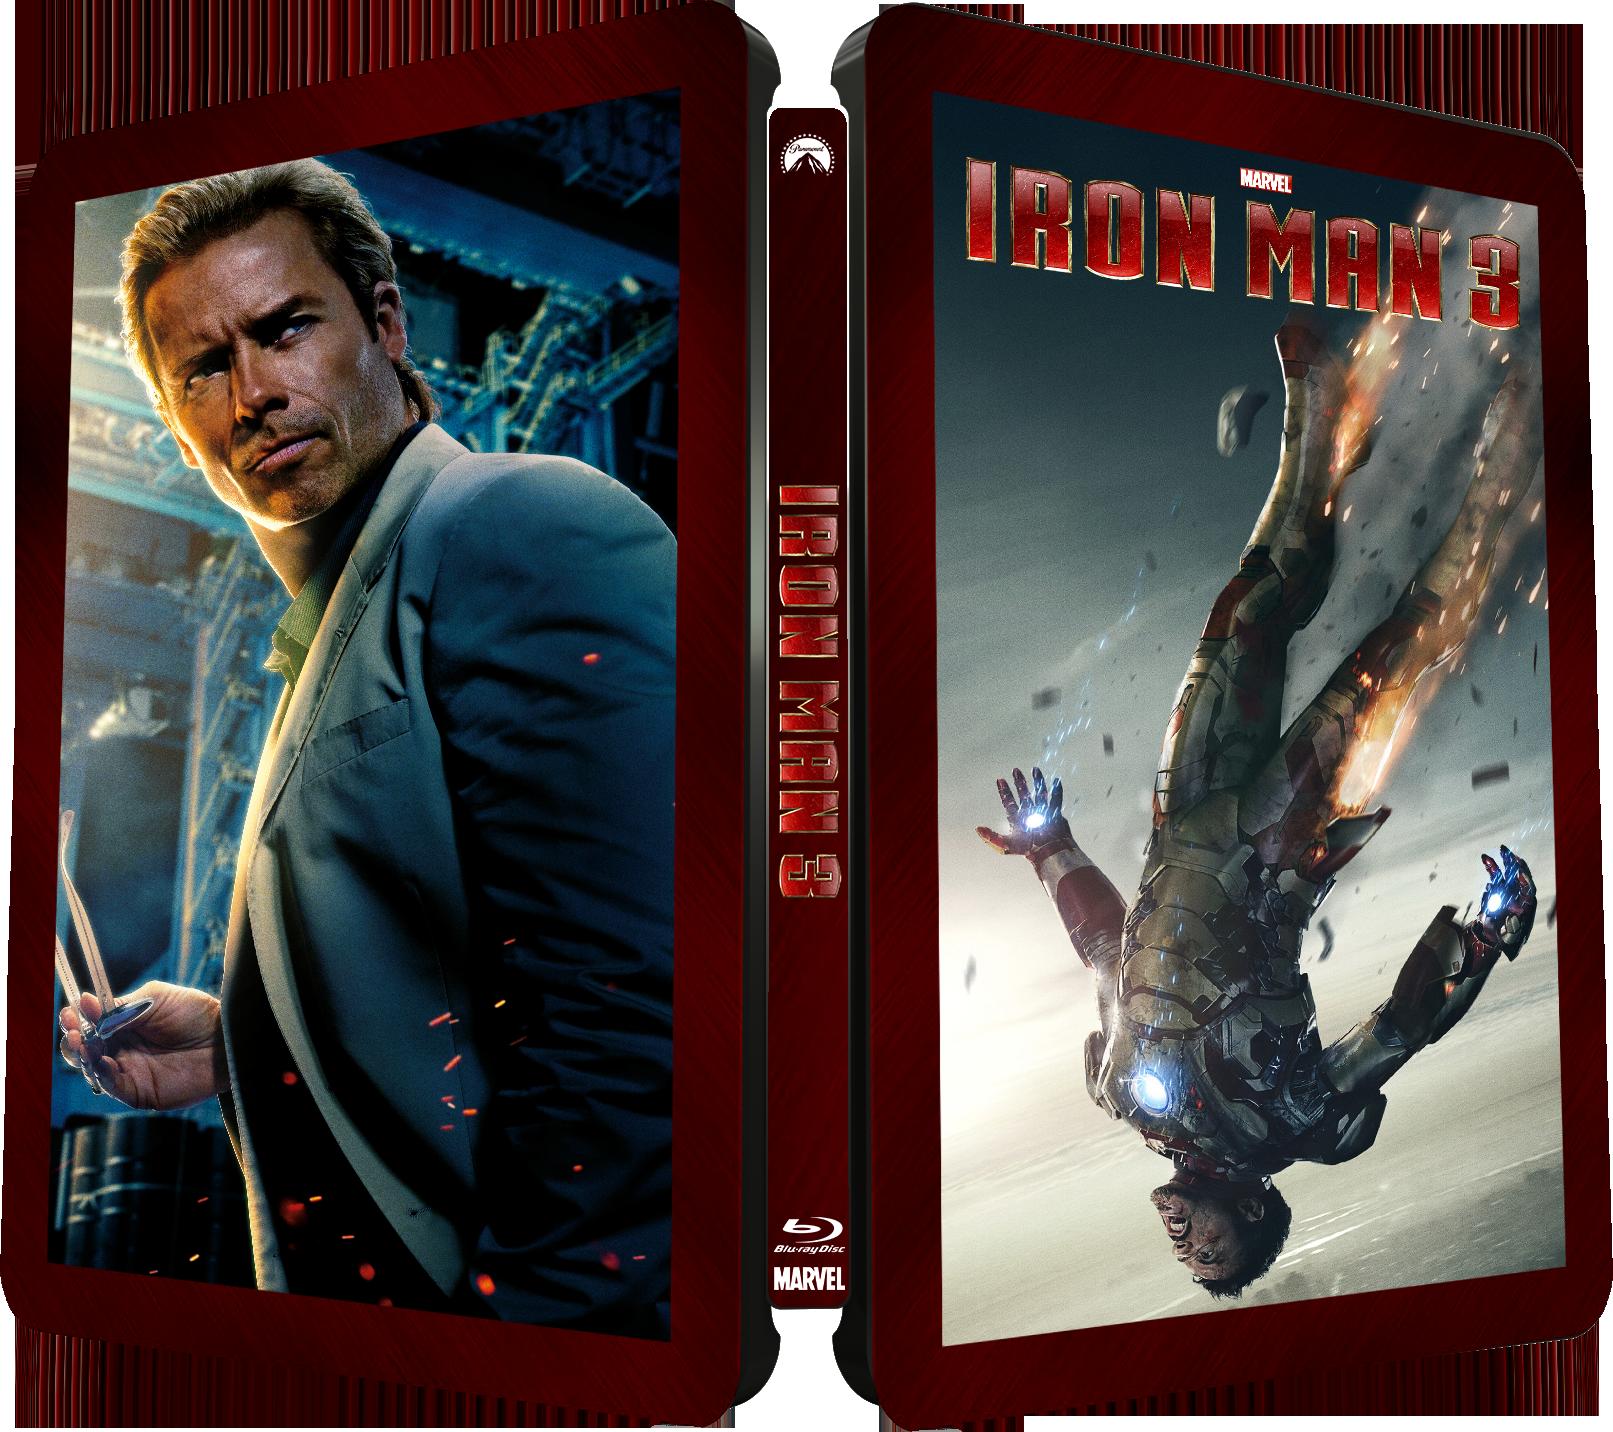 Iron Man 3  Zavvi Exclusive   Blu-ray Steelbook Iron Man 3 Blu Ray Steelbook